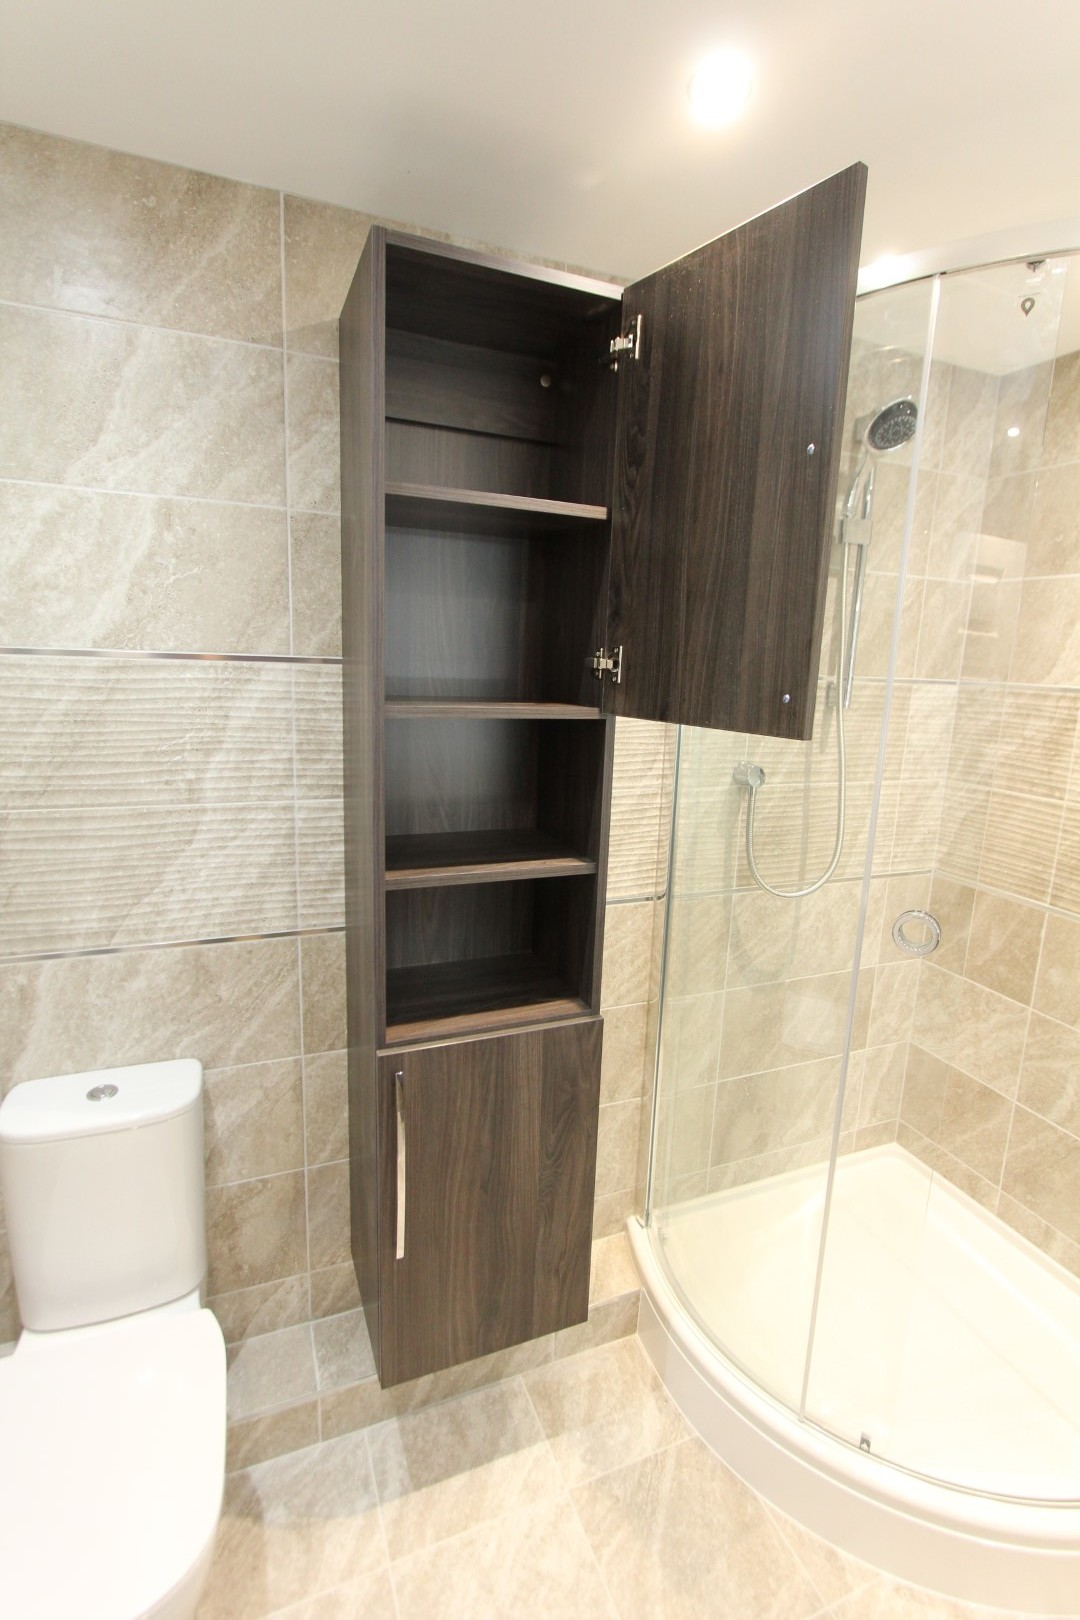 Dack Atlantic Bathrooms & Kitchens (8).jpeg